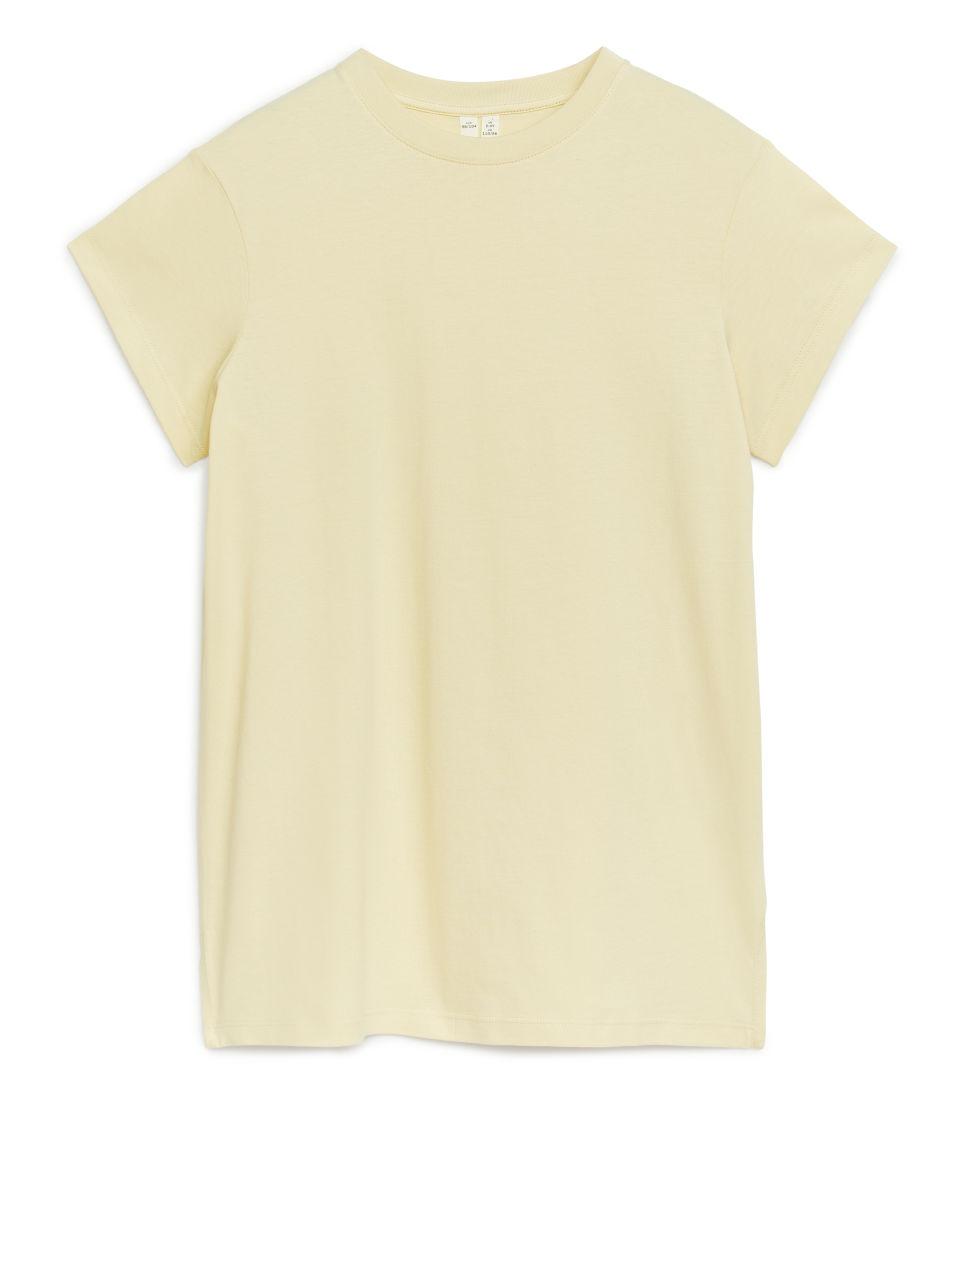 T-Shirt Dress - Yellow